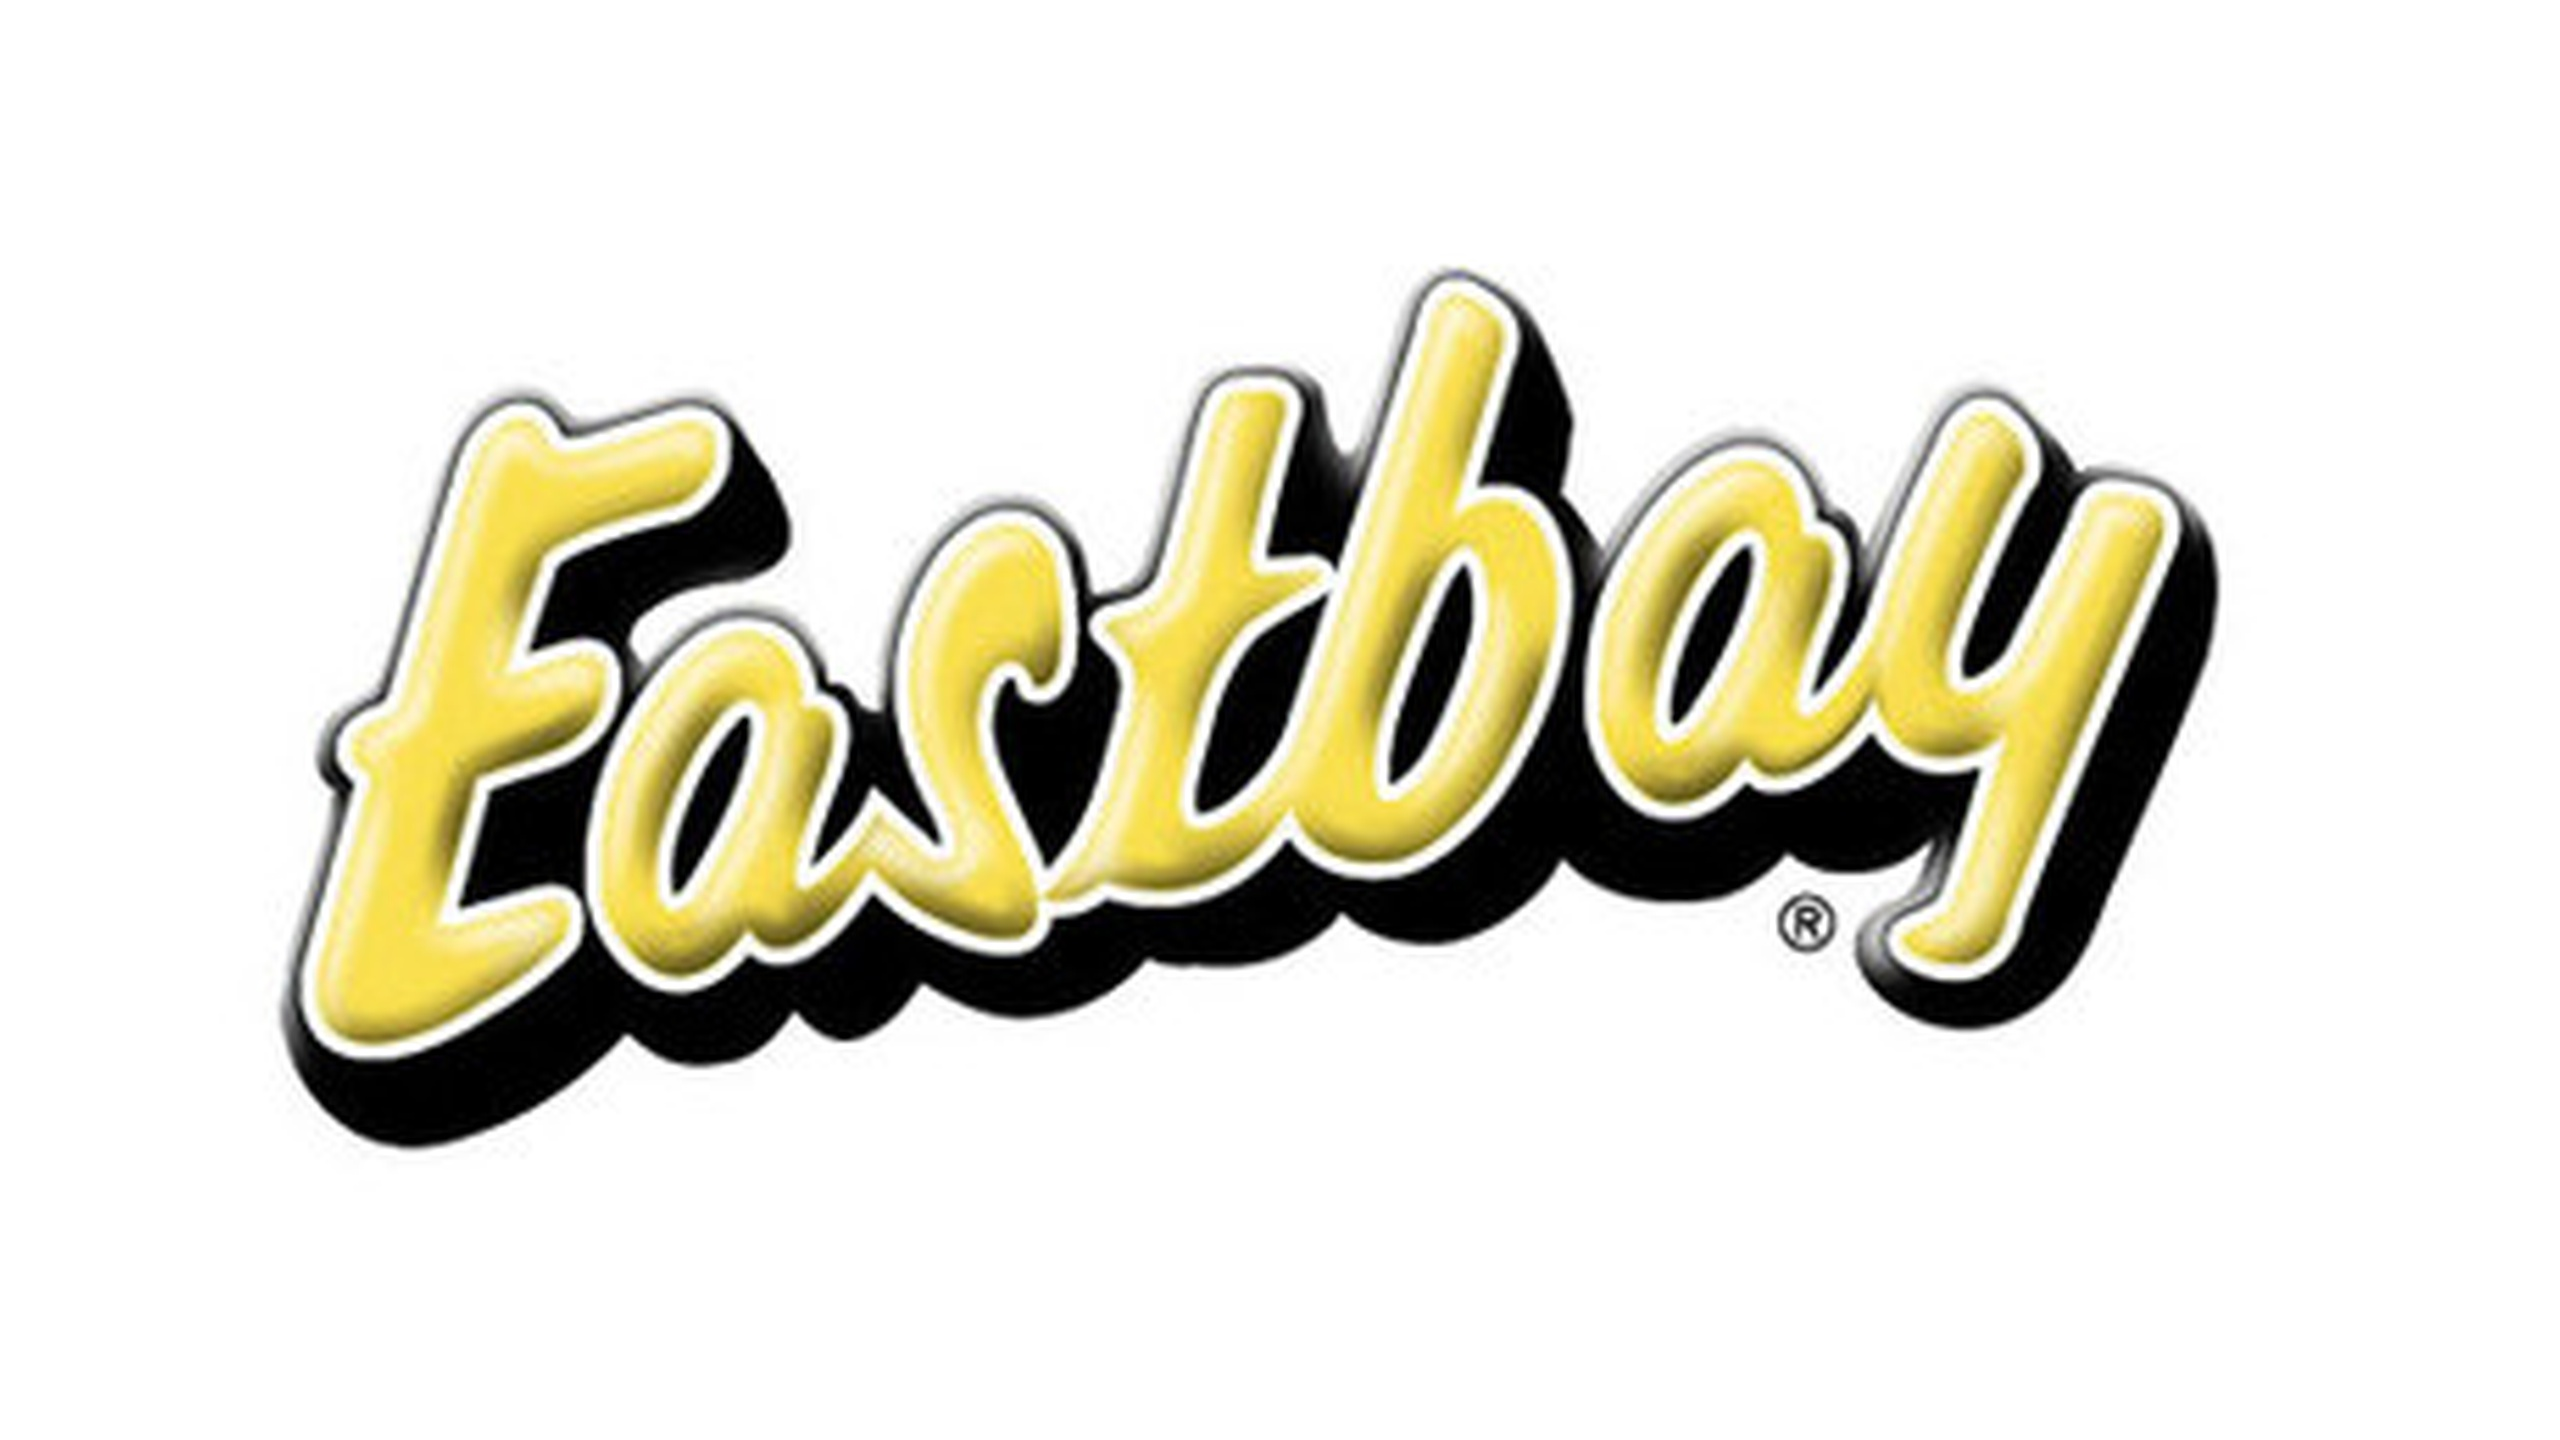 b8dc3557600 Eastbay Promo Code - Eastbay Promo Code